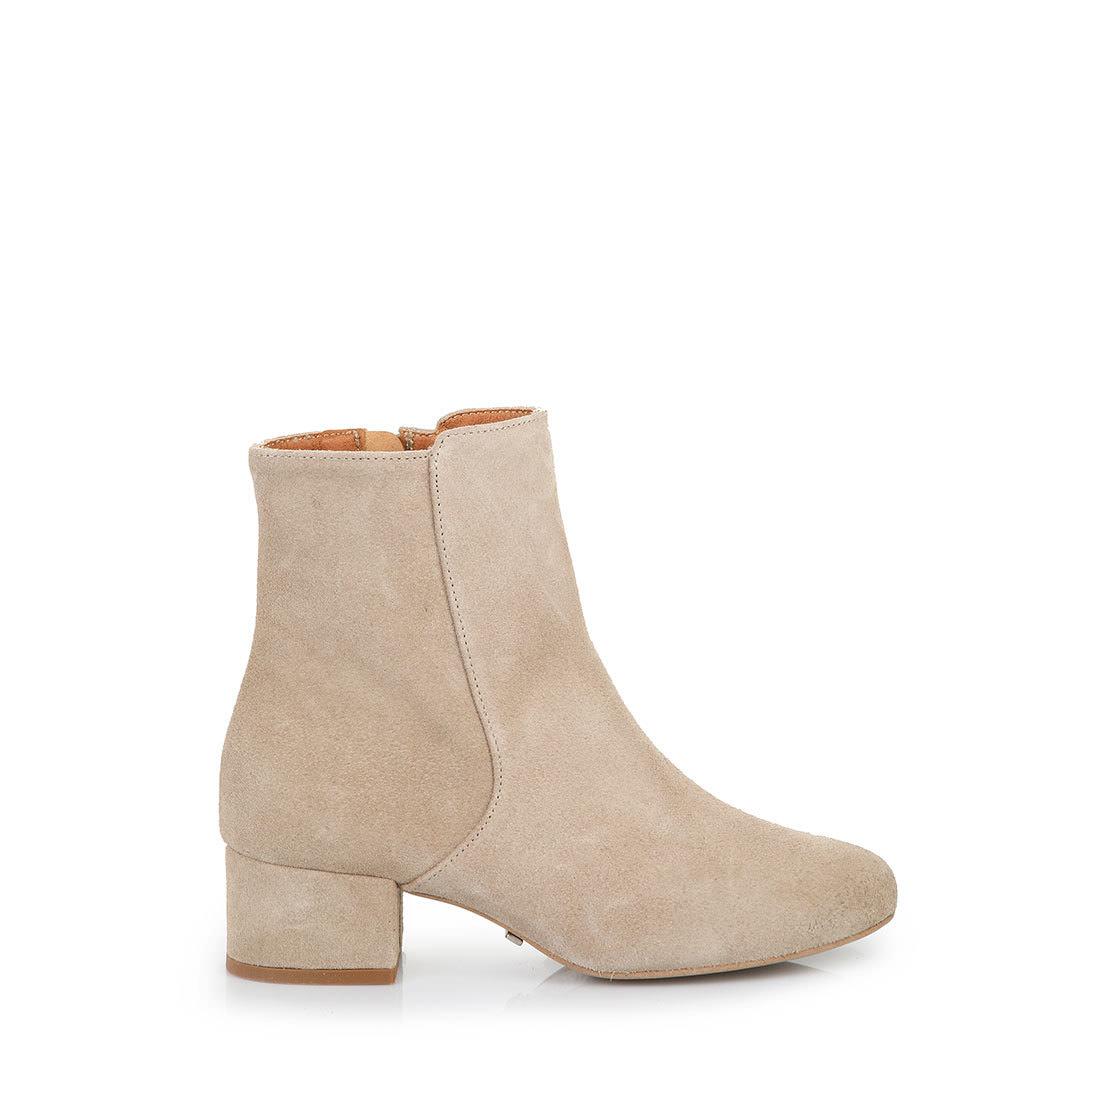 buffalo ankle boots in sand buy online in buffalo online shop buffalo. Black Bedroom Furniture Sets. Home Design Ideas